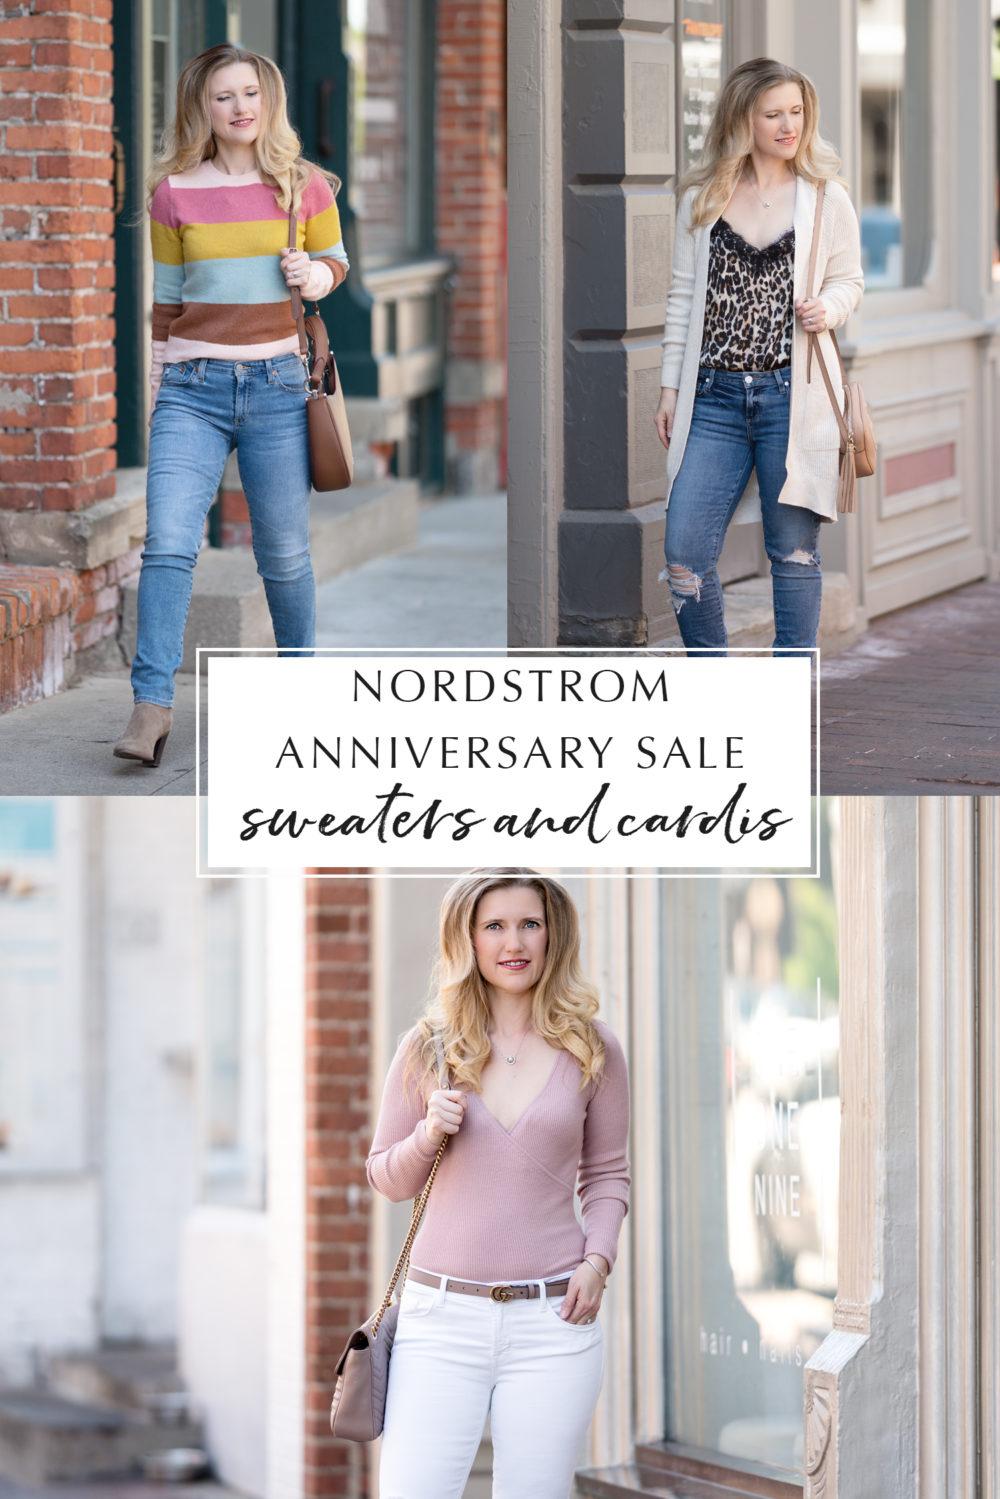 Petite Fashion Blog | Nordstrom Anniversary Sale | Nordstrom Anniversary Sale Sweaters